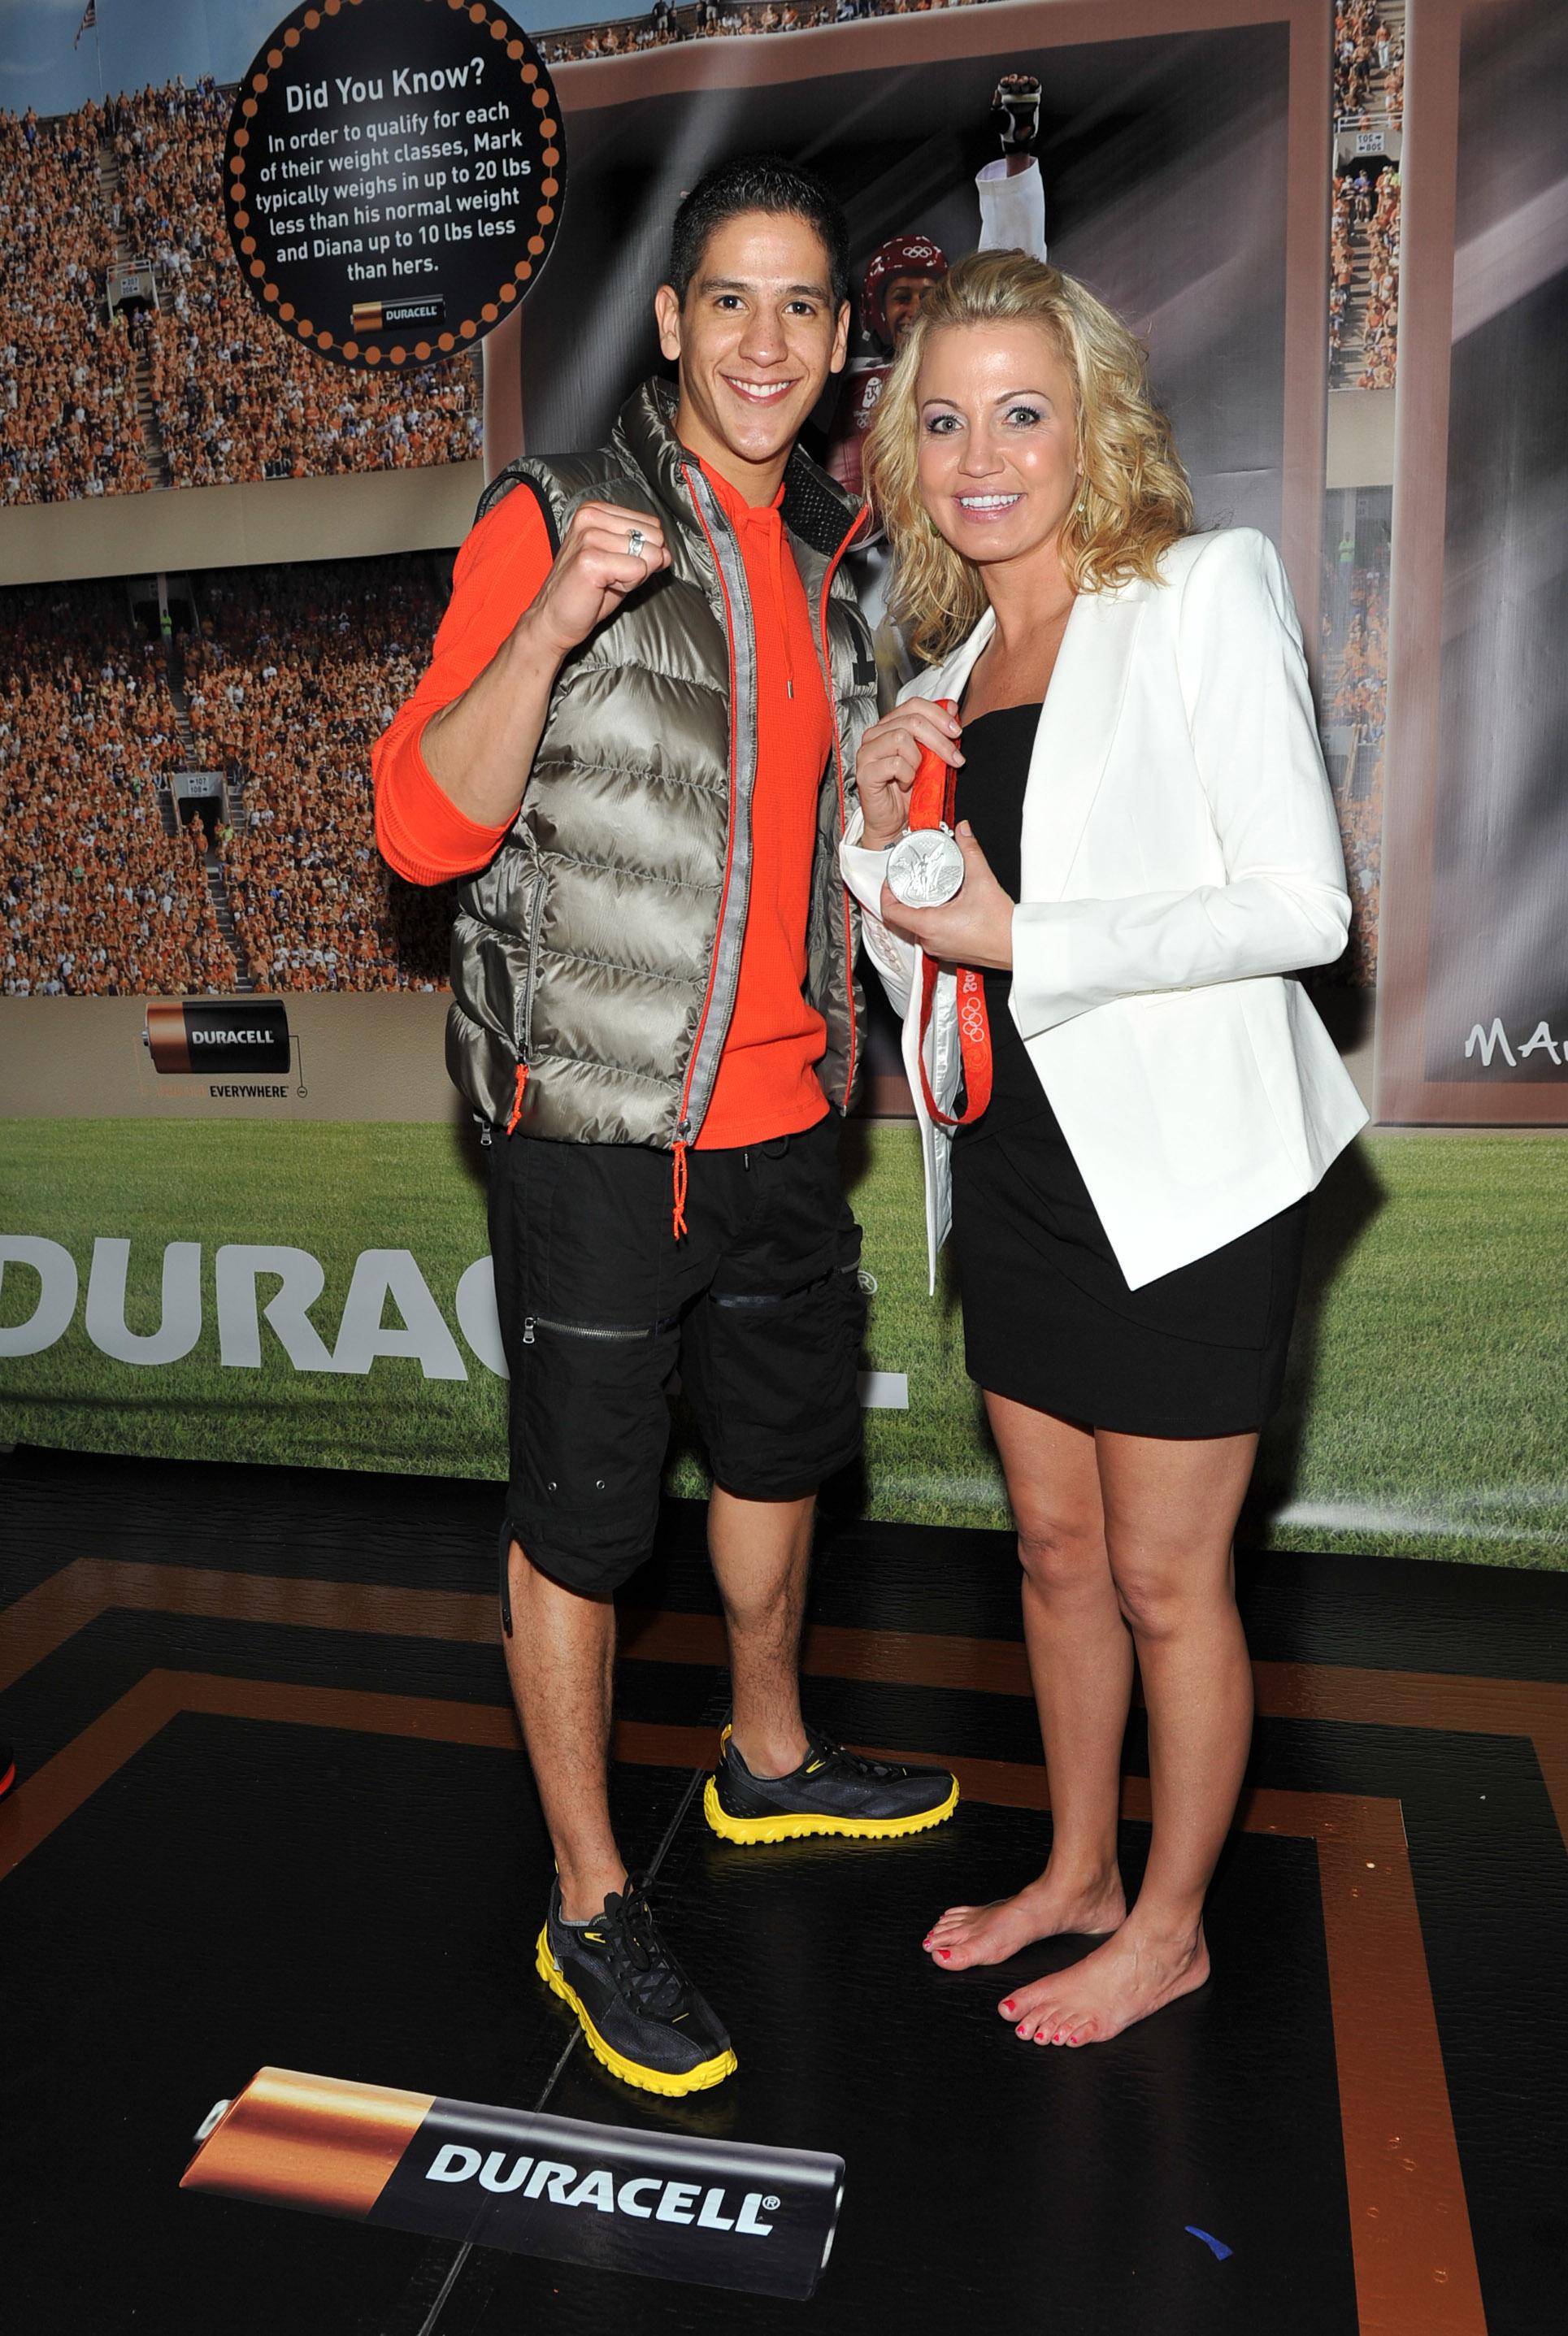 Michelle Beadle Heels Michelle Beadle's Feet